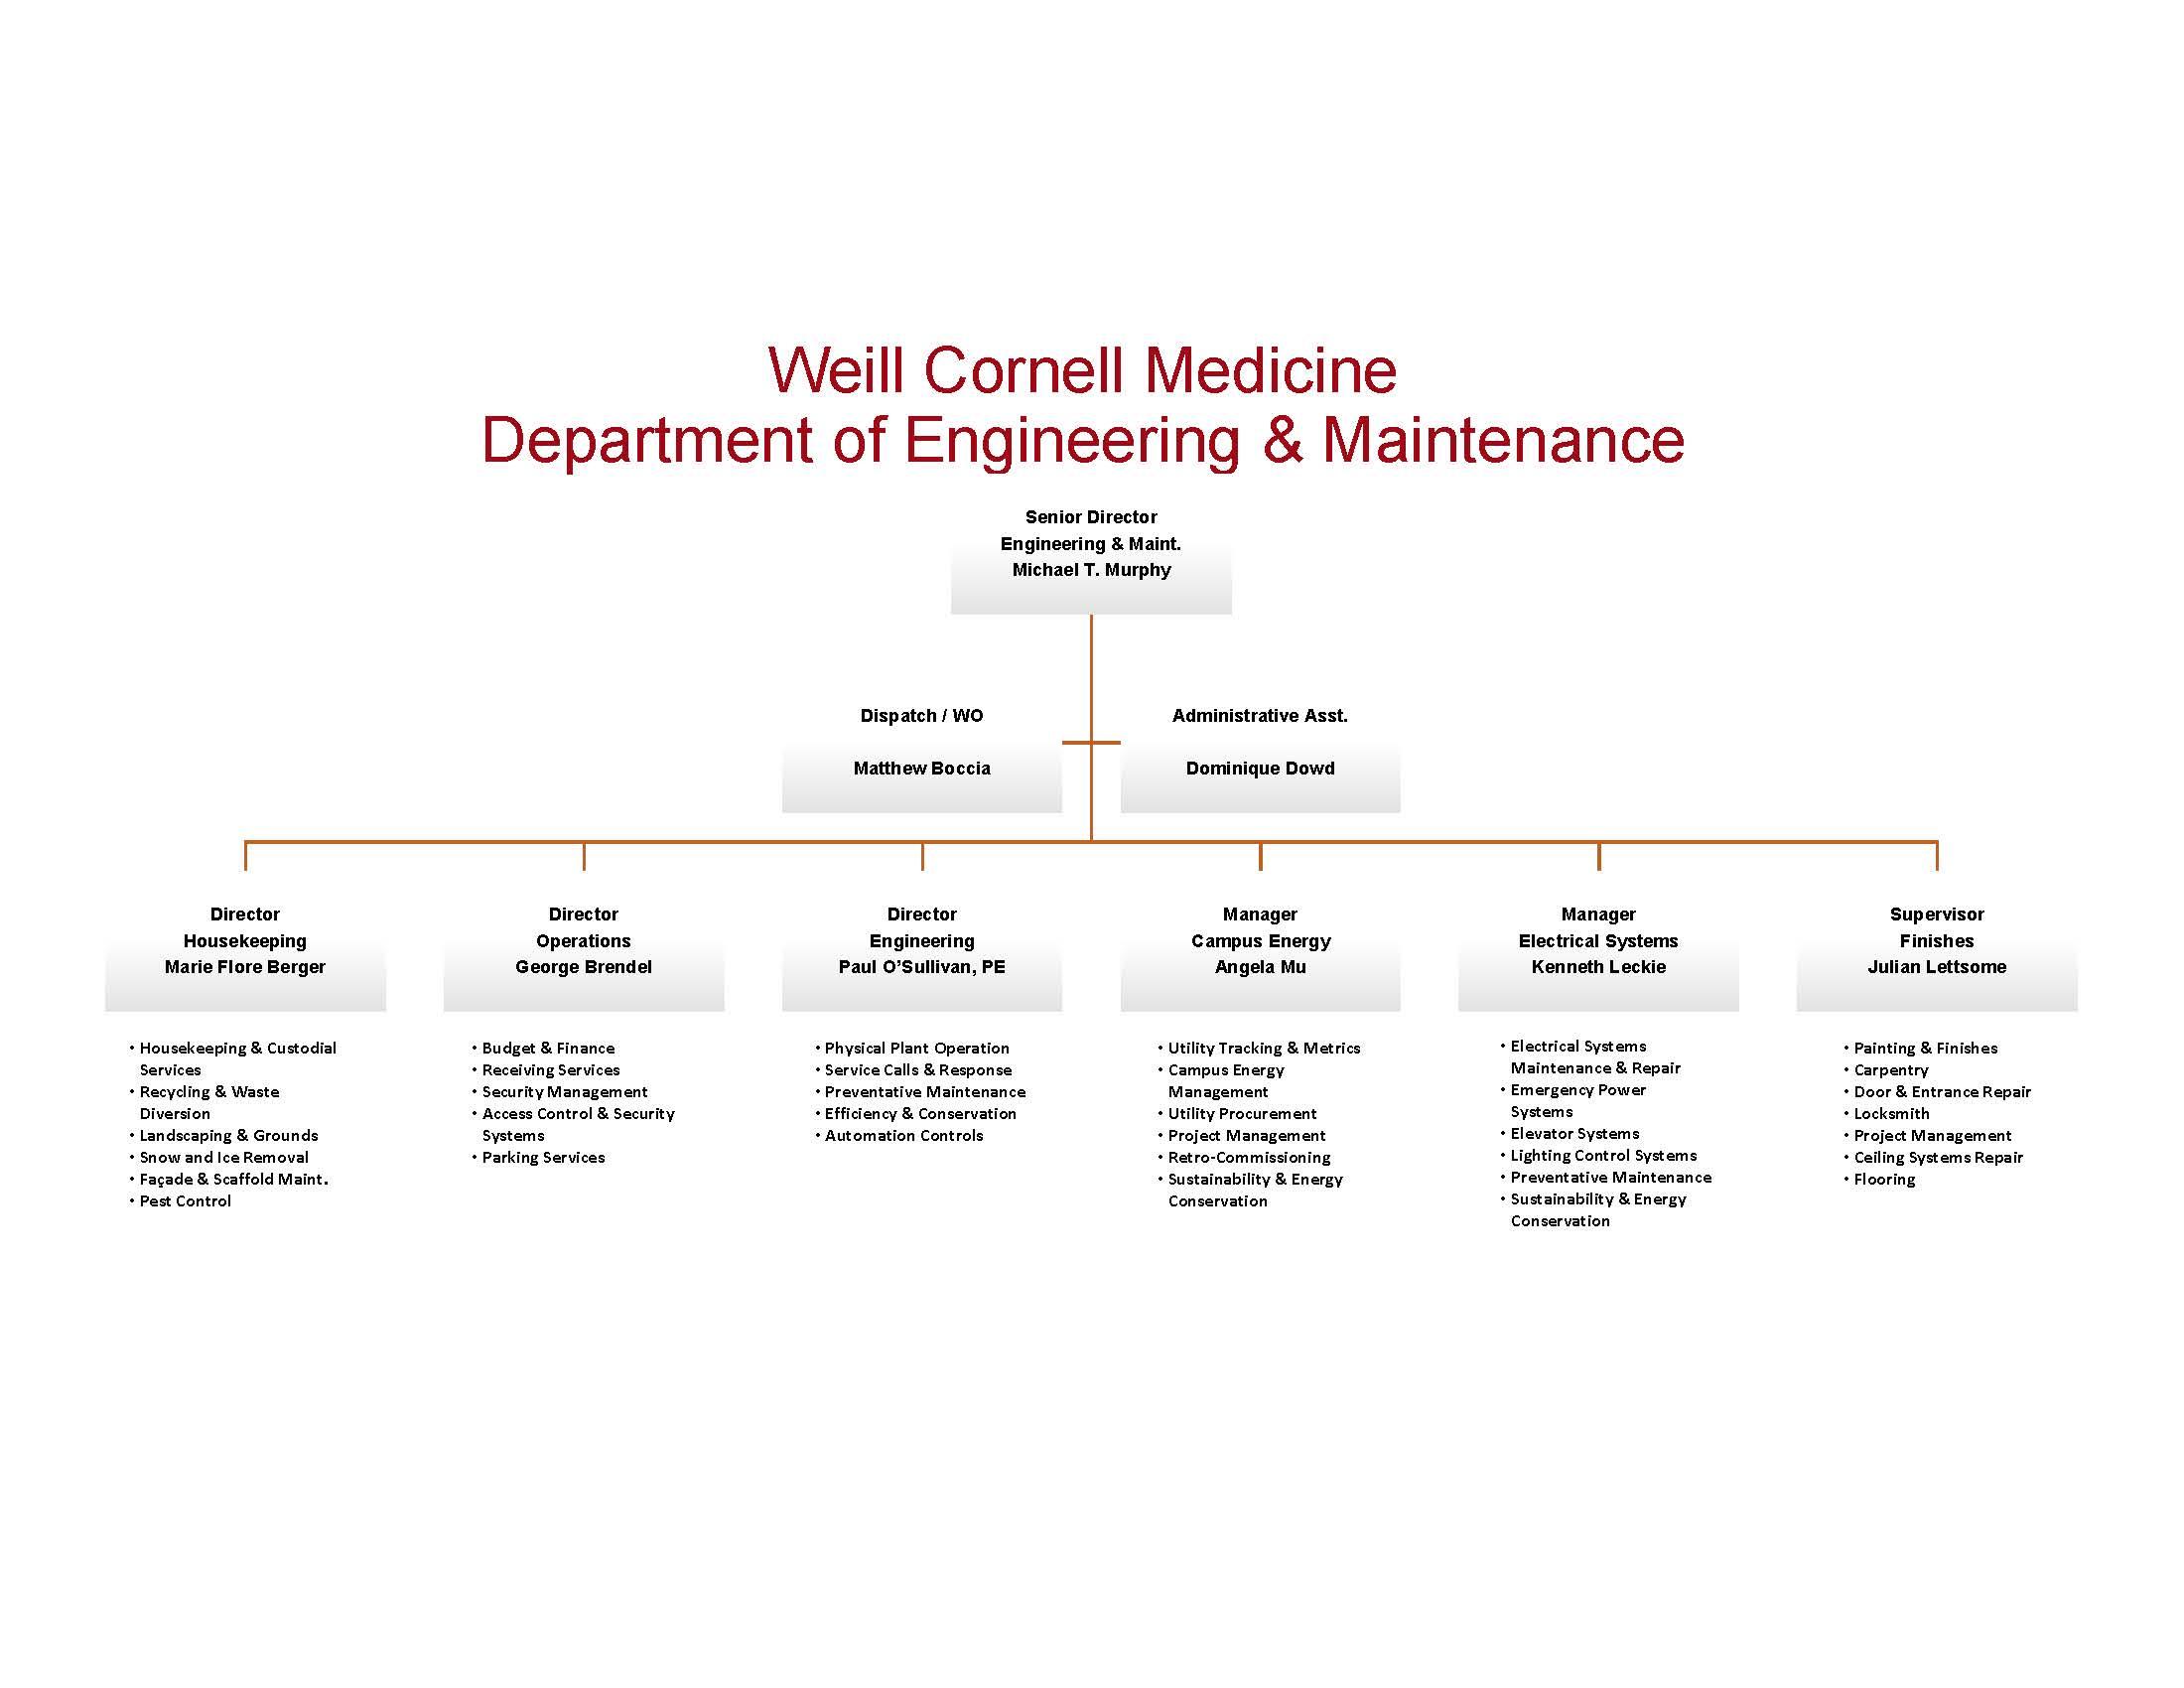 Org Chart E&M